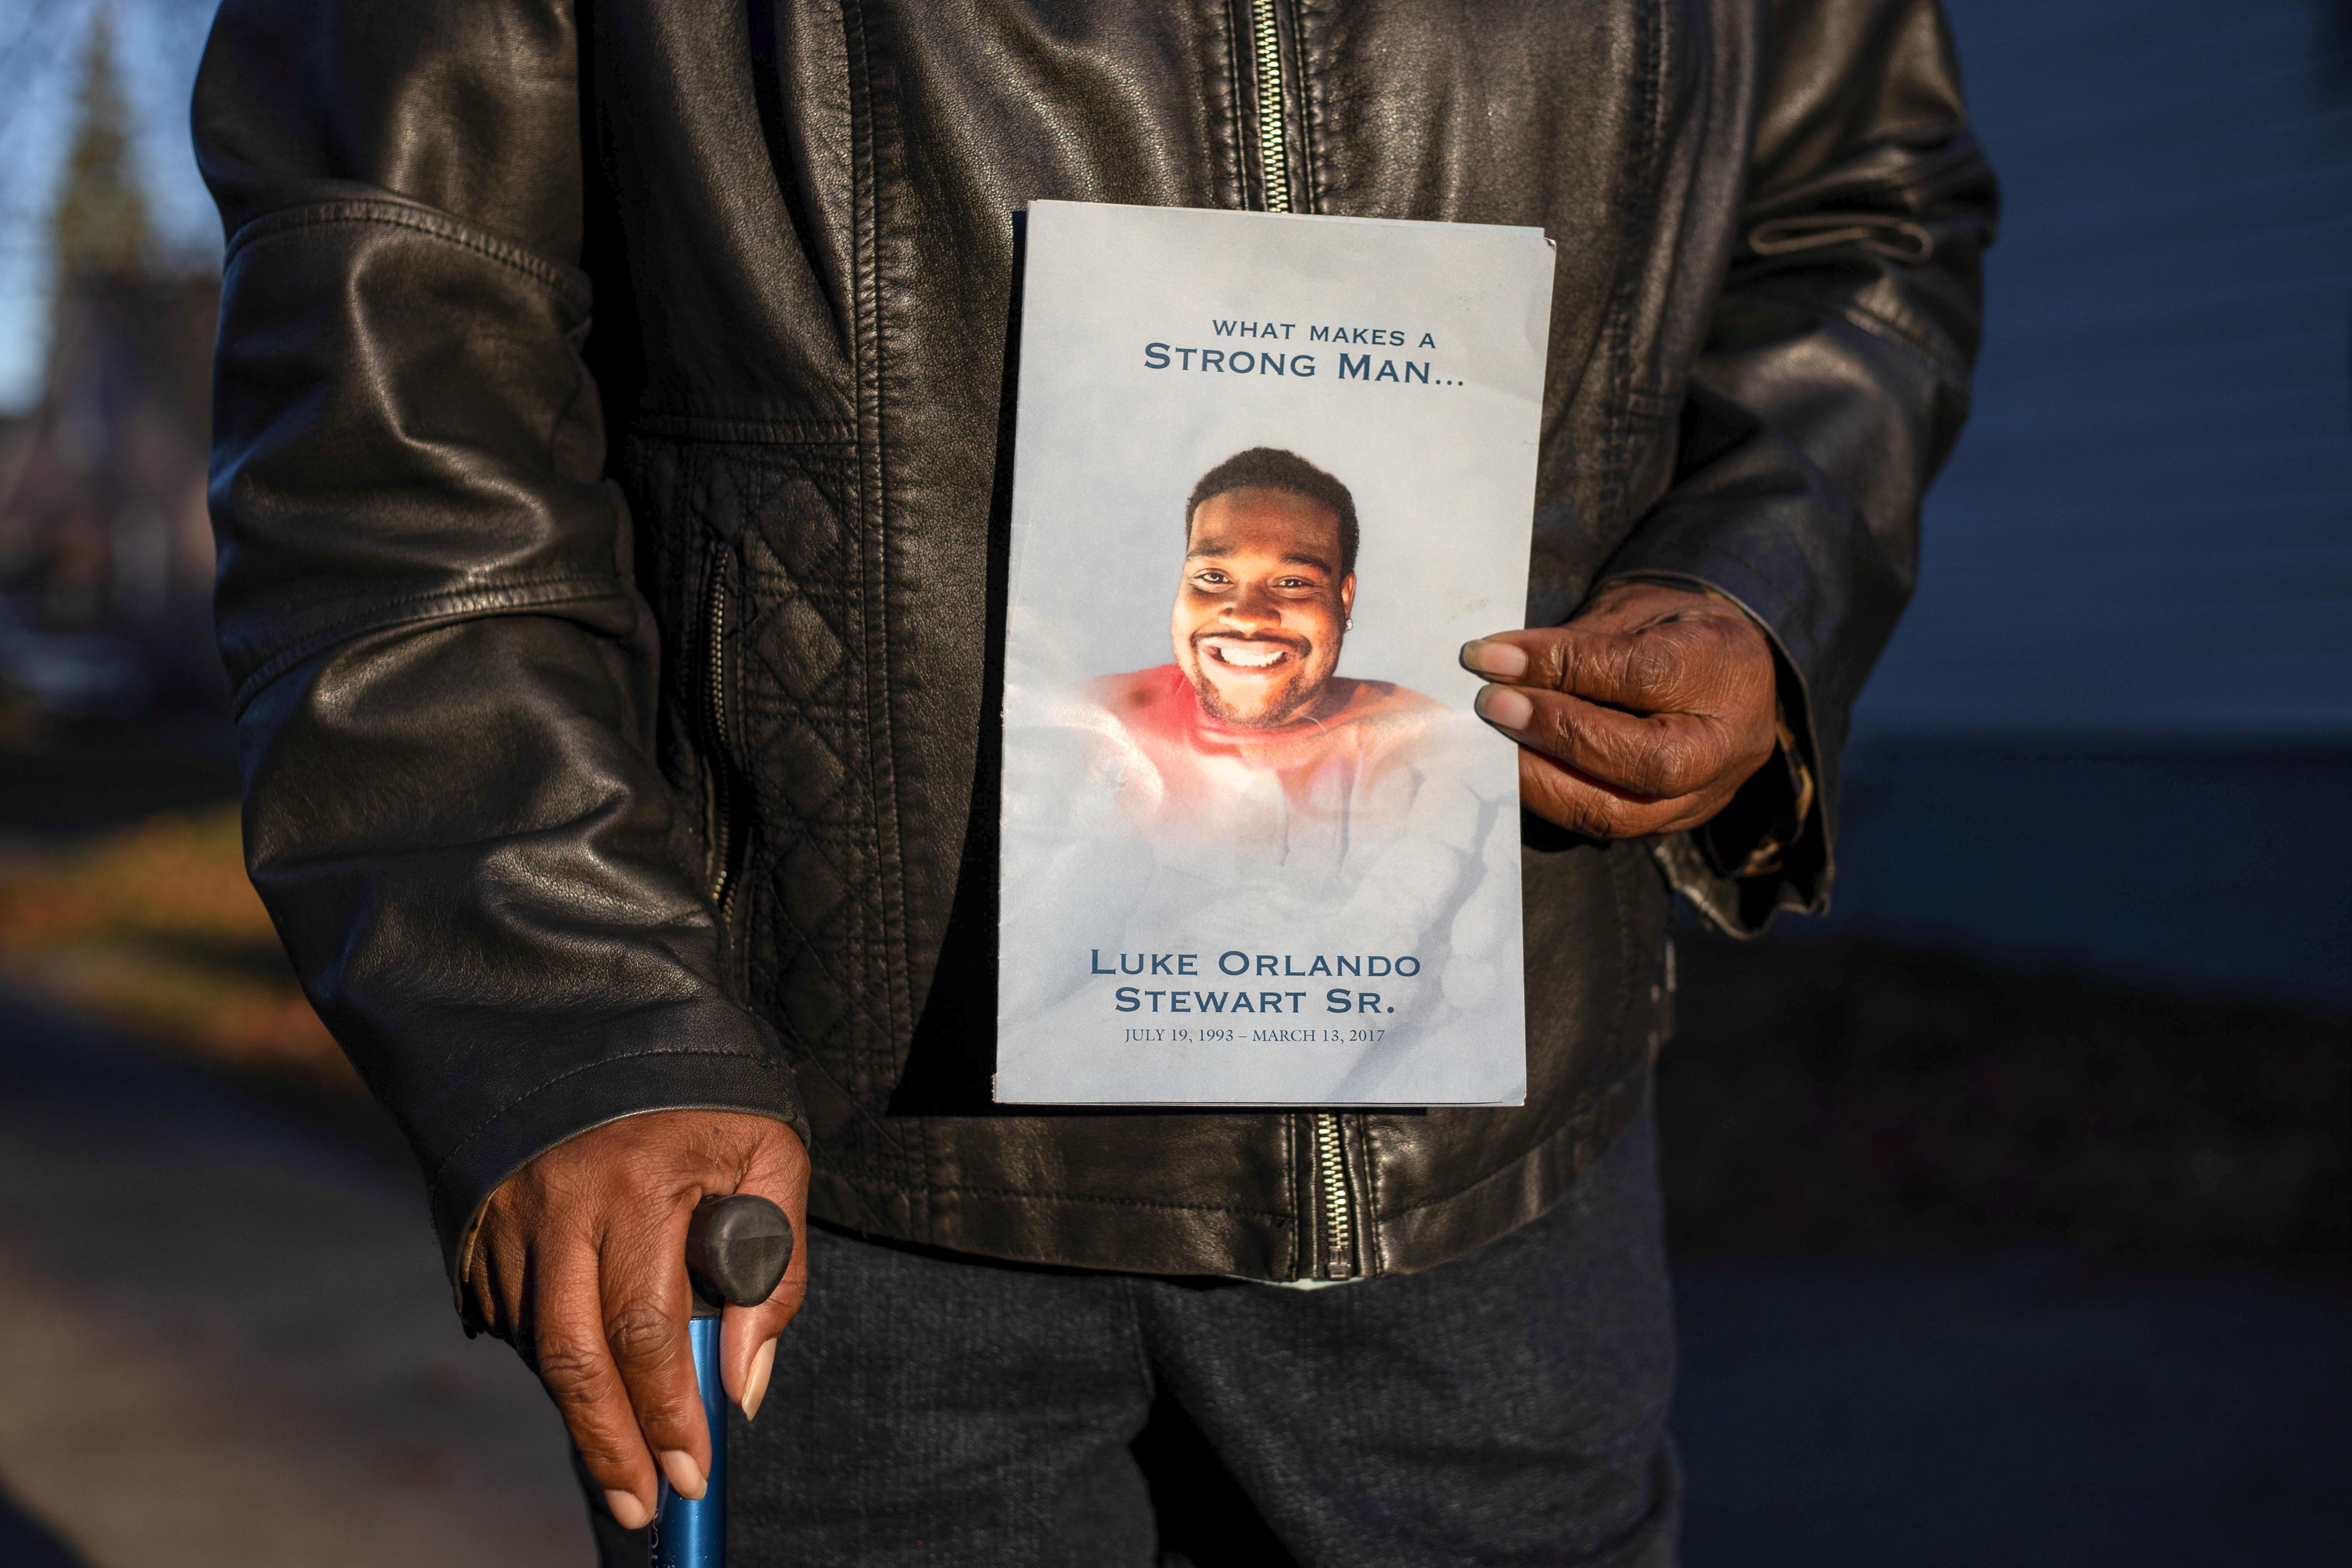 Mary Stewart holds an obituary of her son Luke Stewart, in Cleveland, Ohio, U.S., November 12, 2020. REUTERS/Megan Jelinger